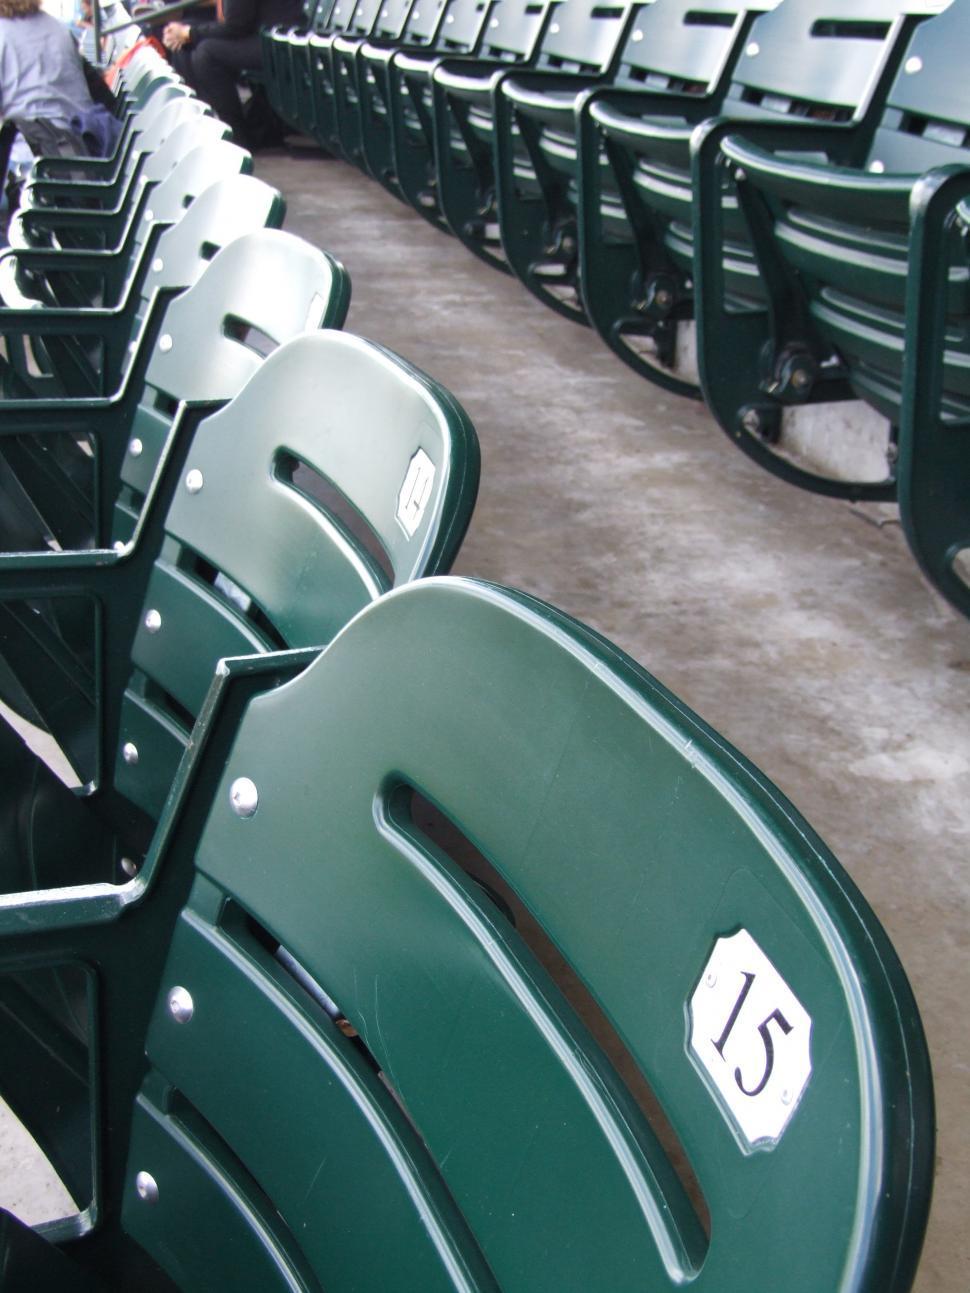 Download Free Stock HD Photo of Bleacher Seats Online